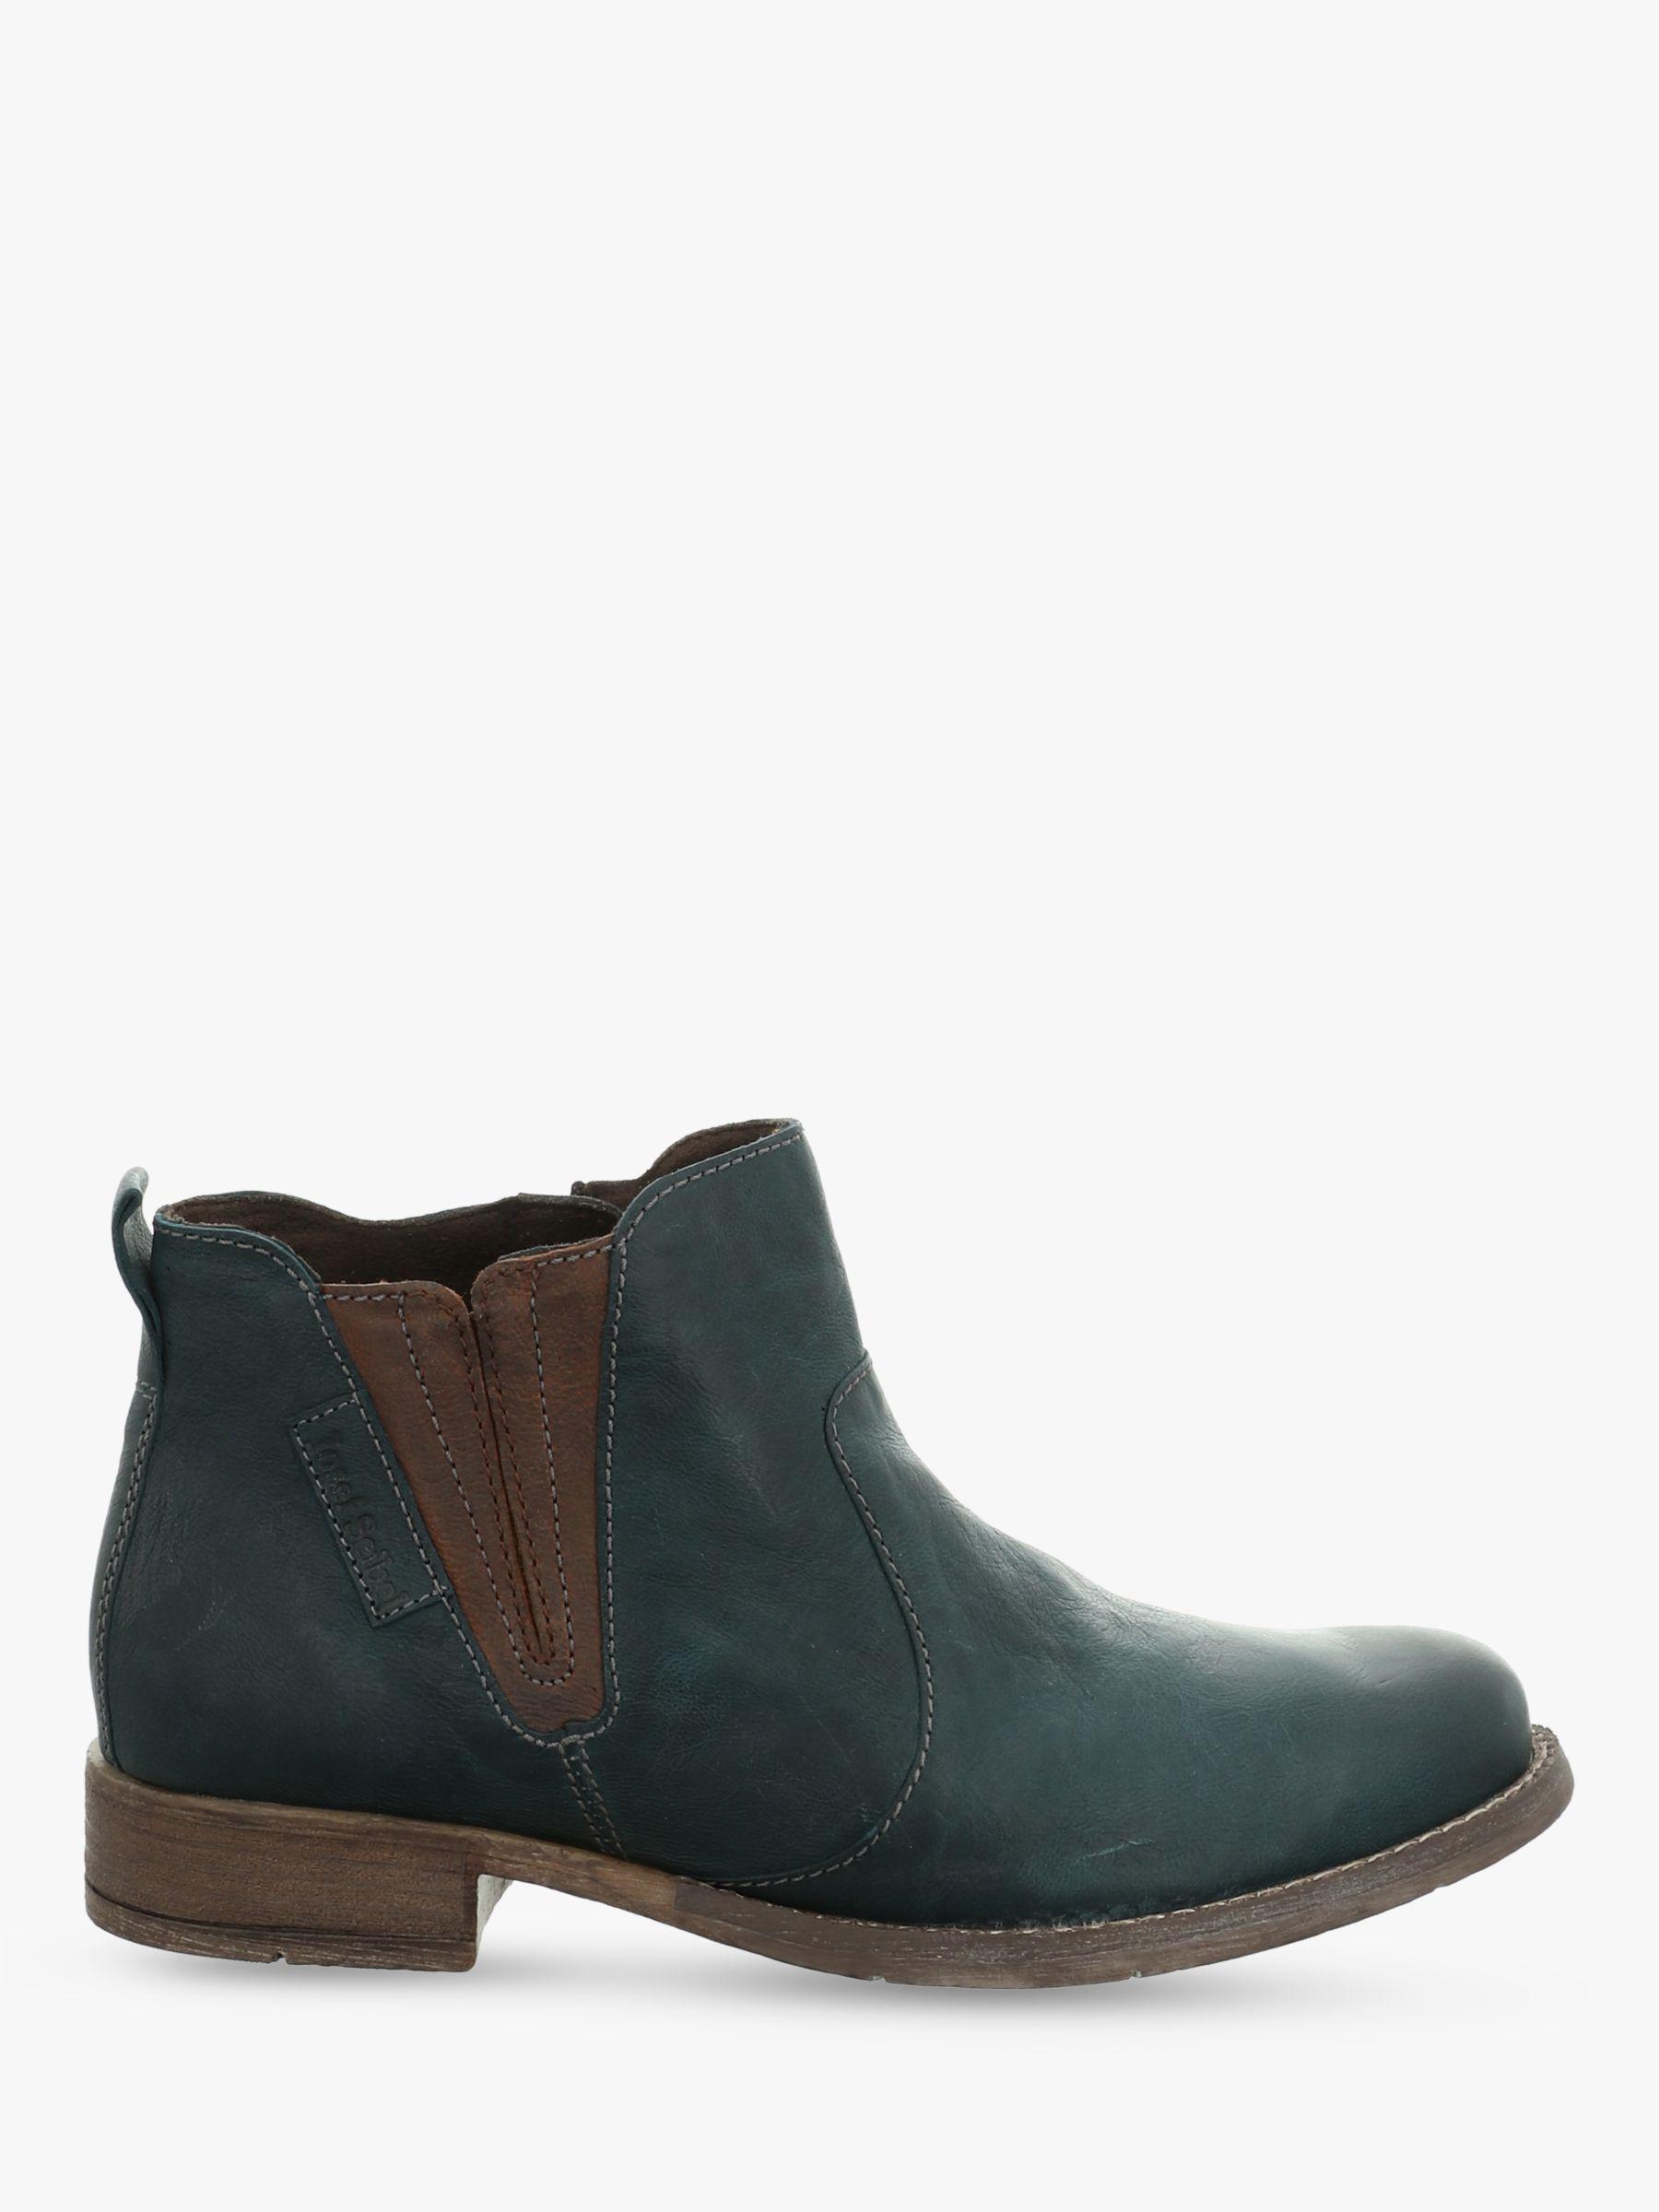 Josef Seibel Josef Seibel Sienna 45 Leather Block Heel Ankle Boots, Petrol Combi